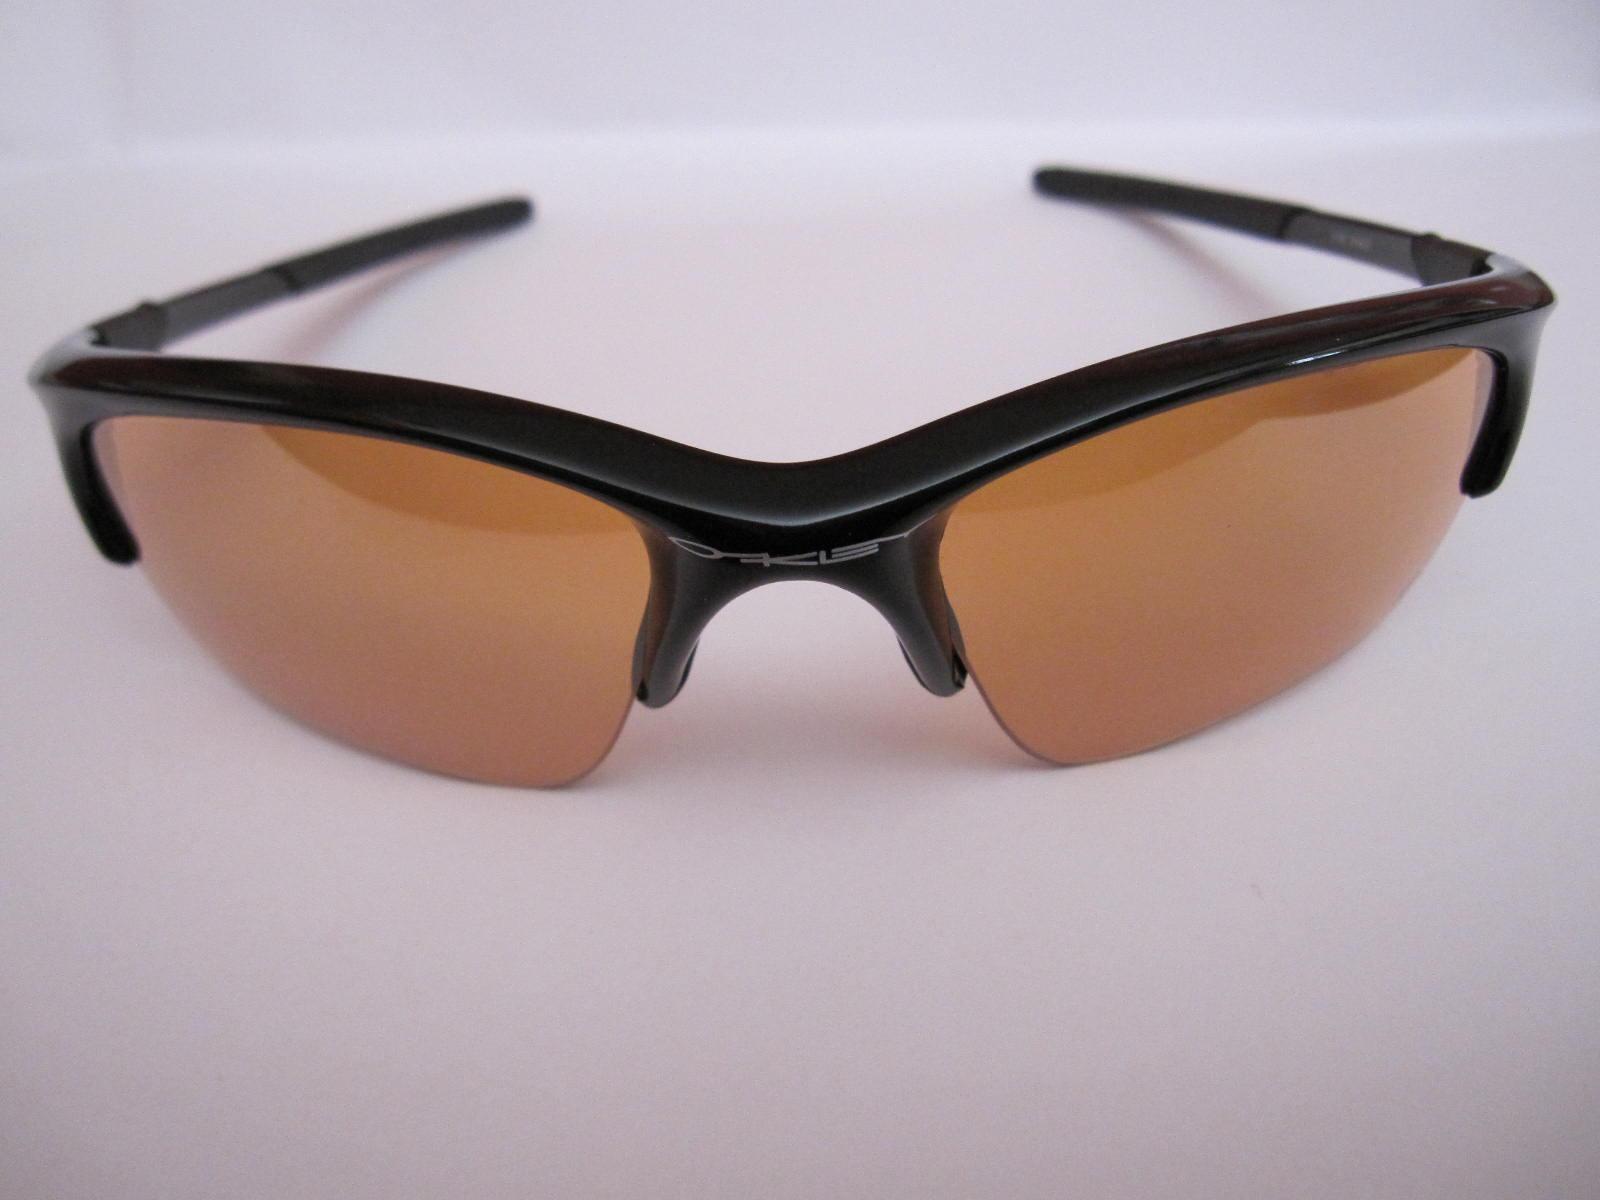 Oakley Persimmon Lens